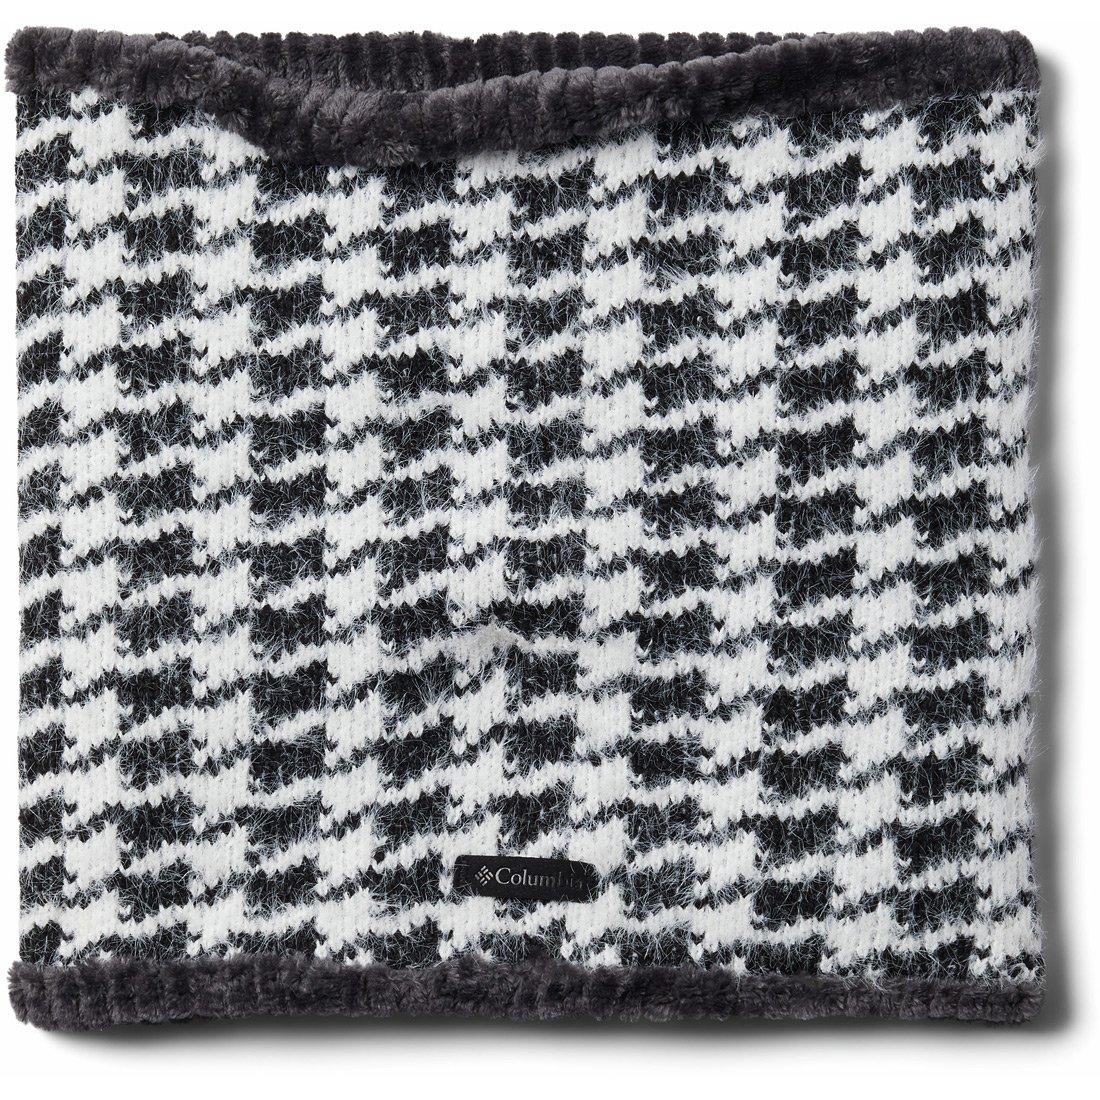 מחמם צוואר - Winter Blur Plush Lined Gaiter - Columbia